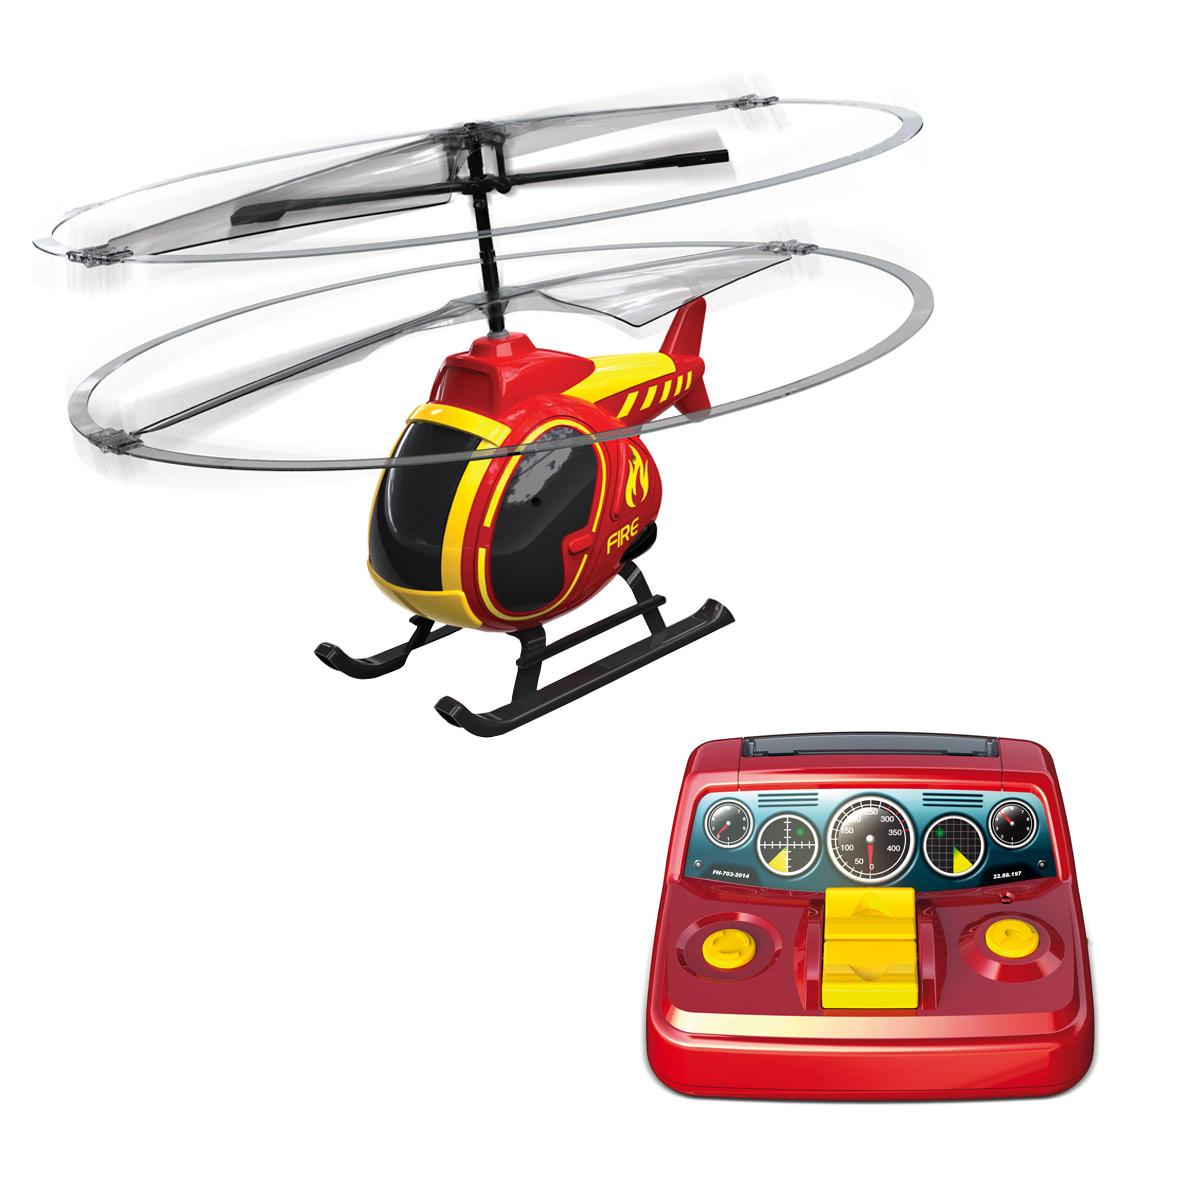 helicoptere telecommande enfant